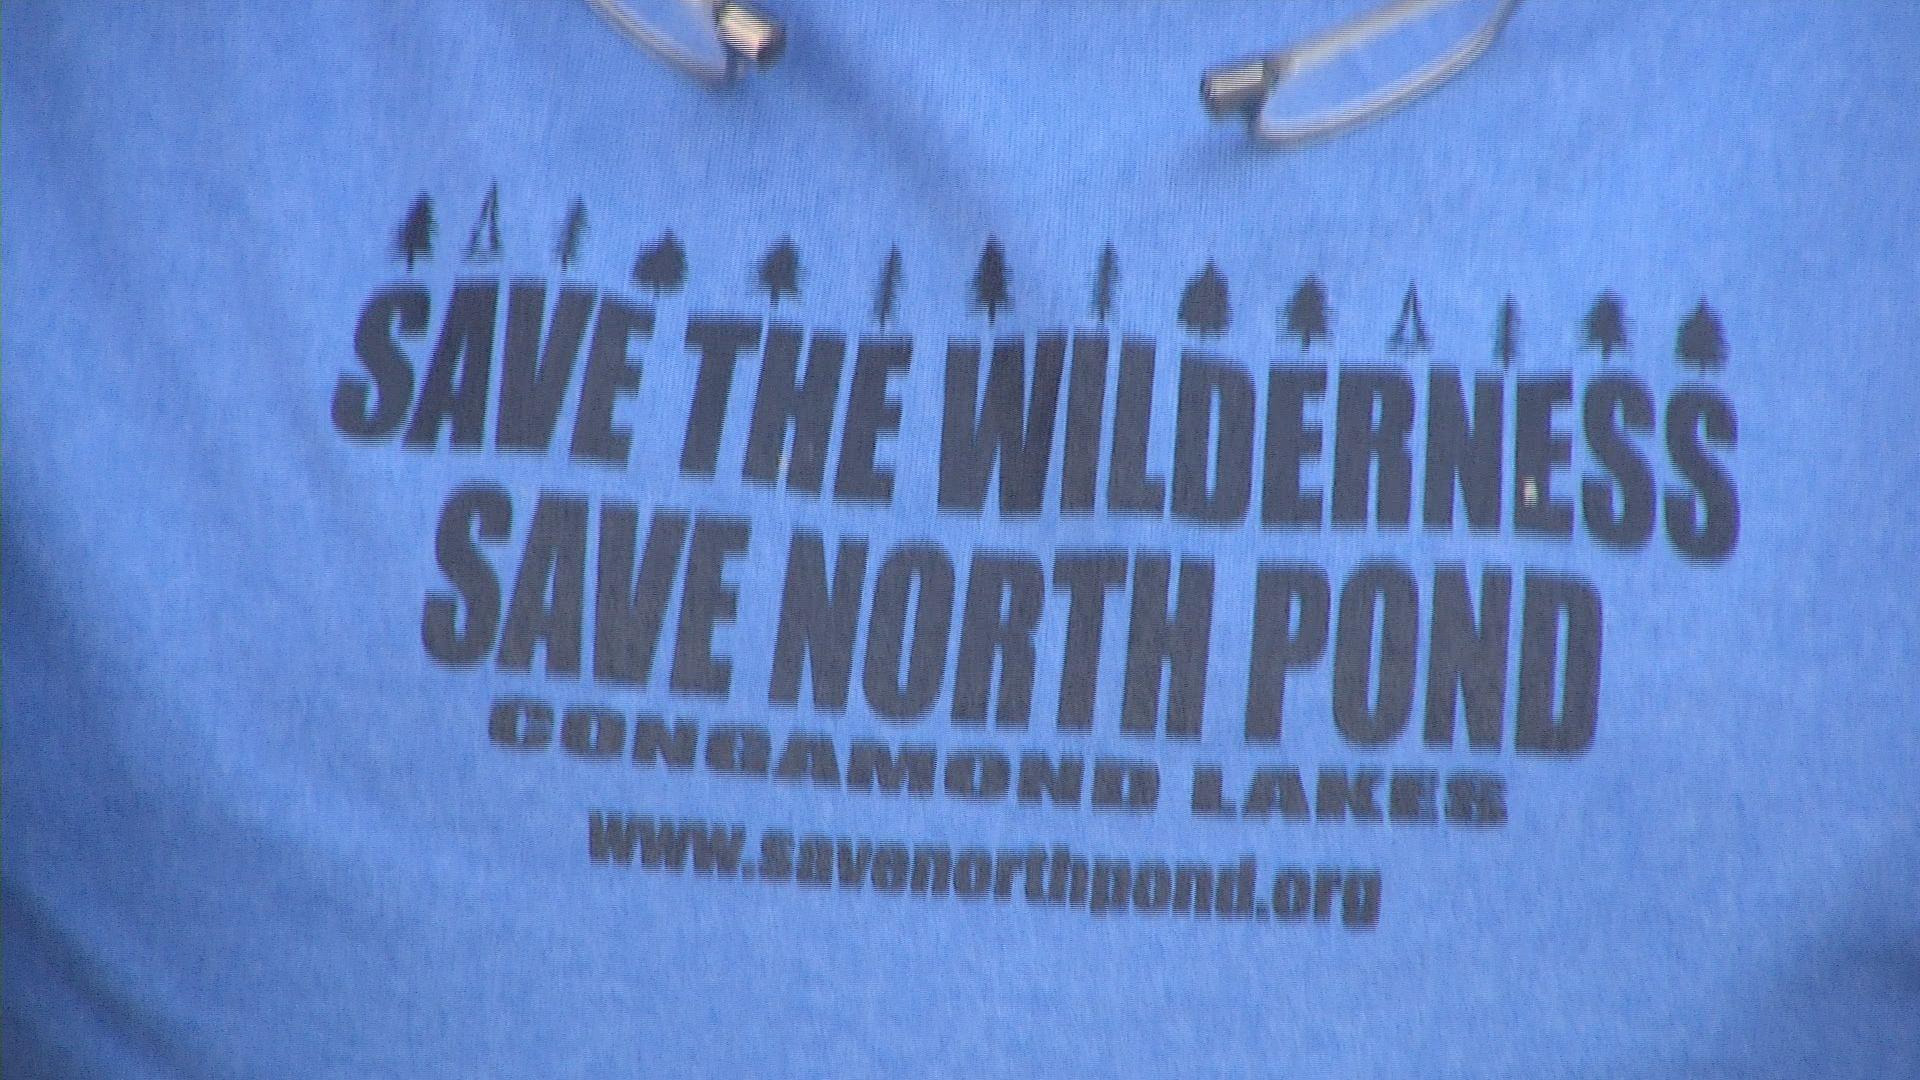 save north pond_1551580809514.jpg.jpg